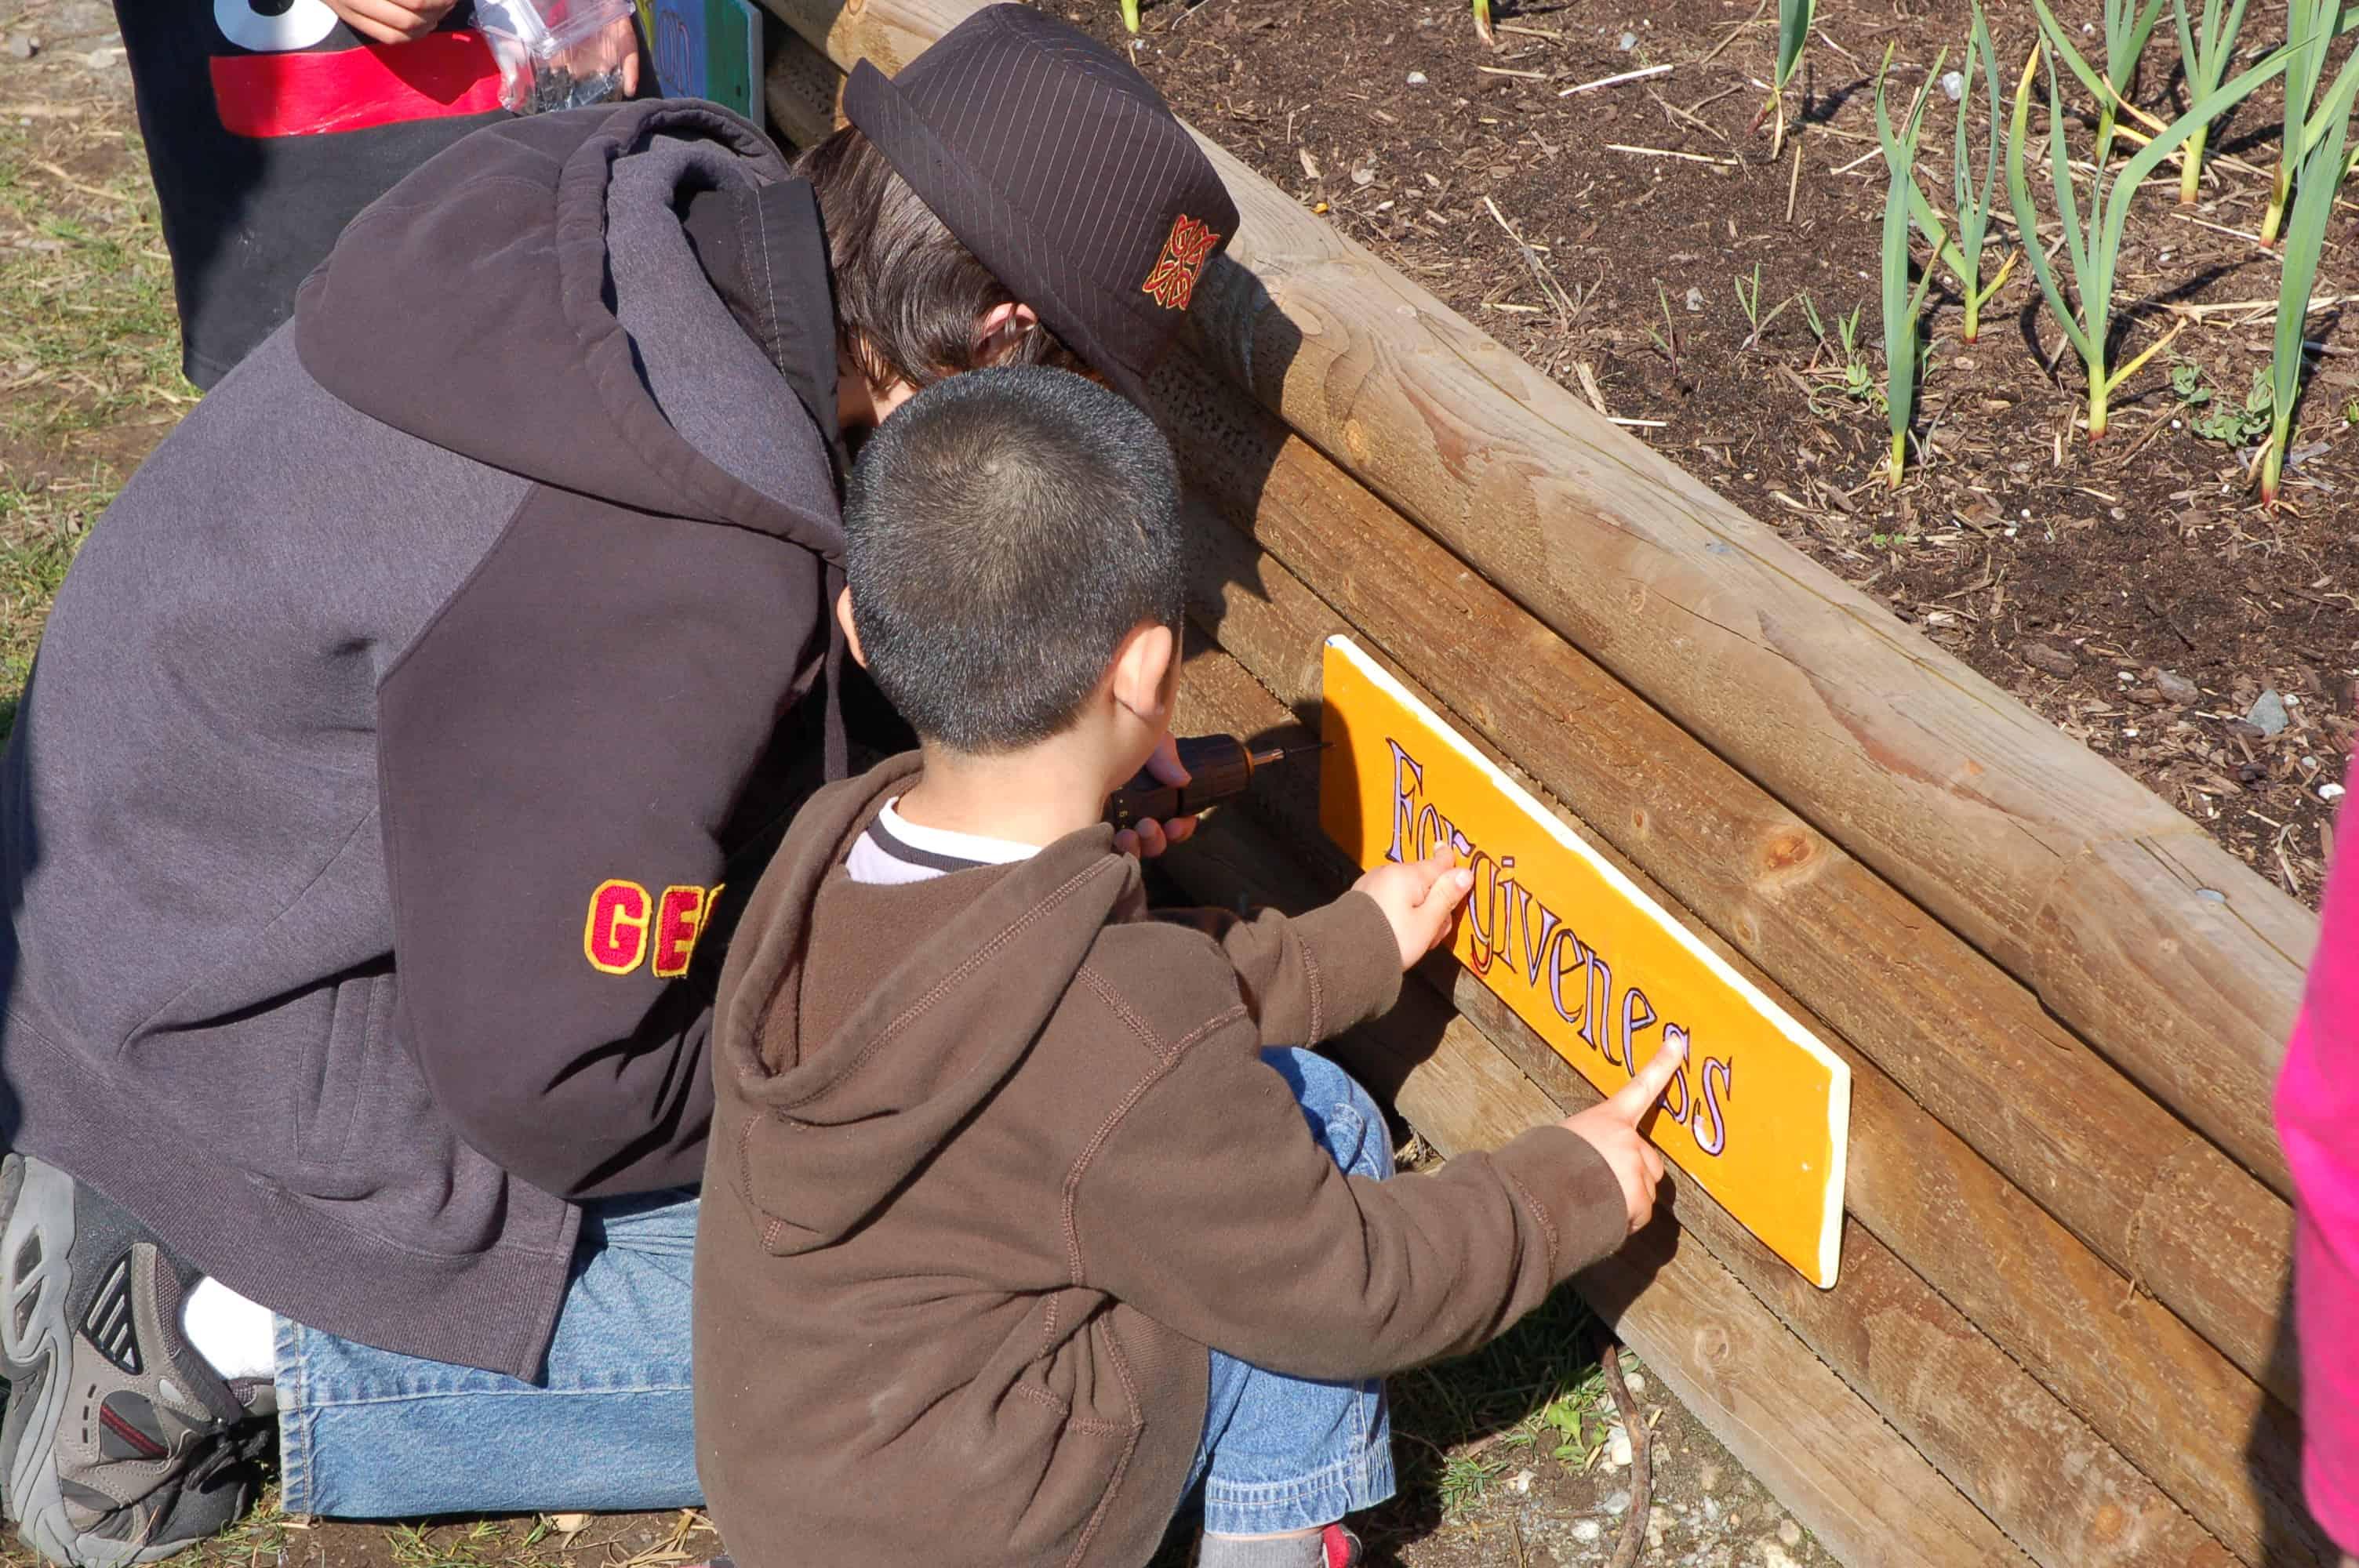 Naming the school garden